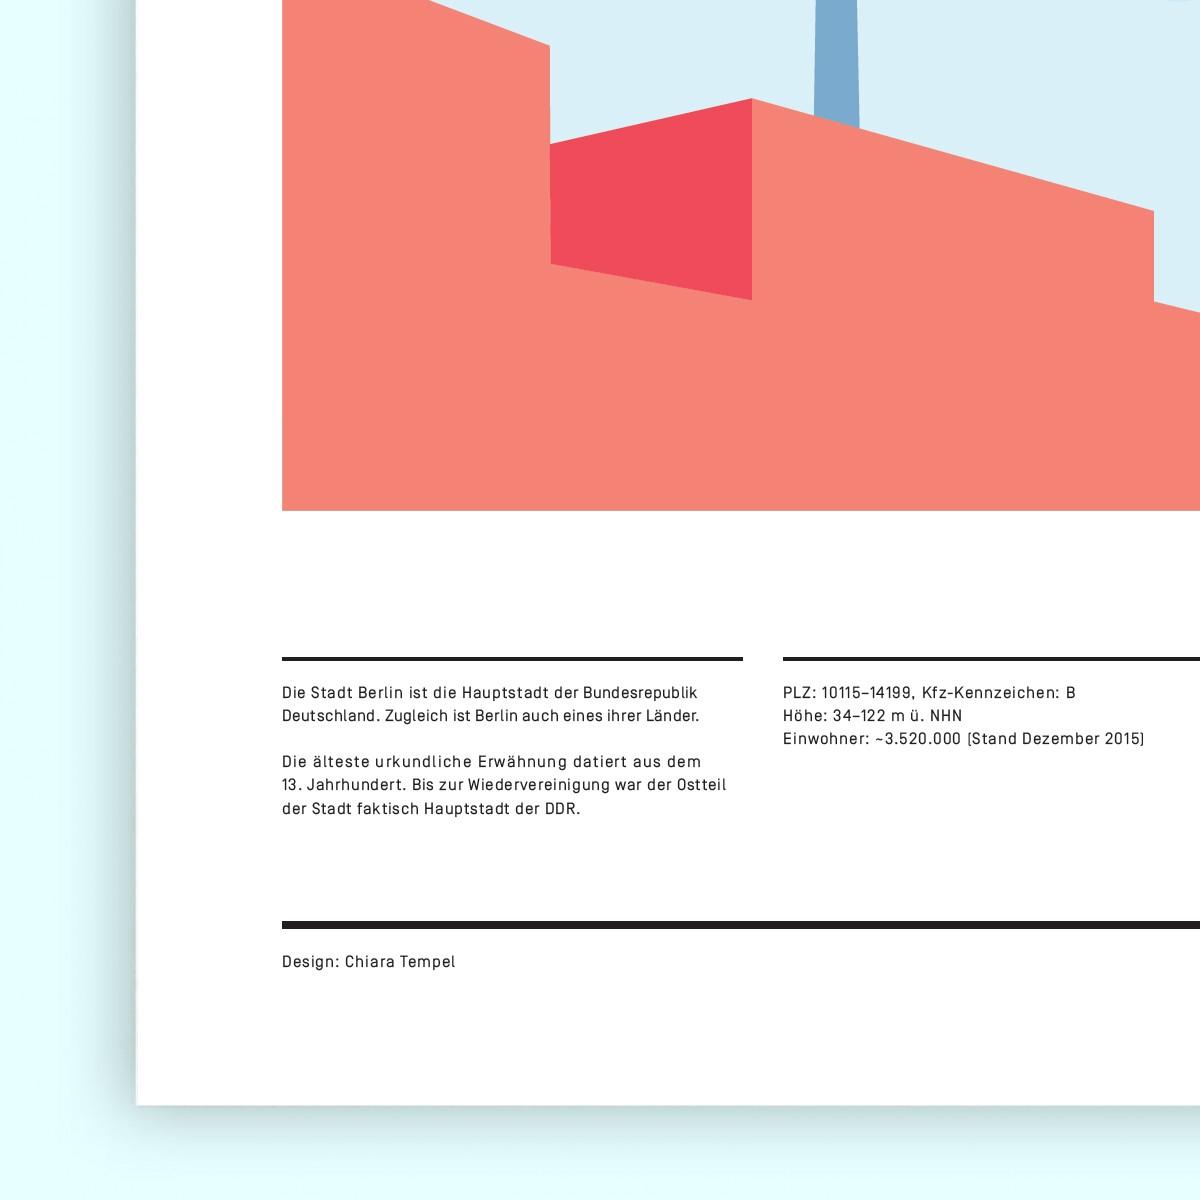 Chiara Tempel – Berlin, du bist so wunderbar – Poster A3 (297x420mm)